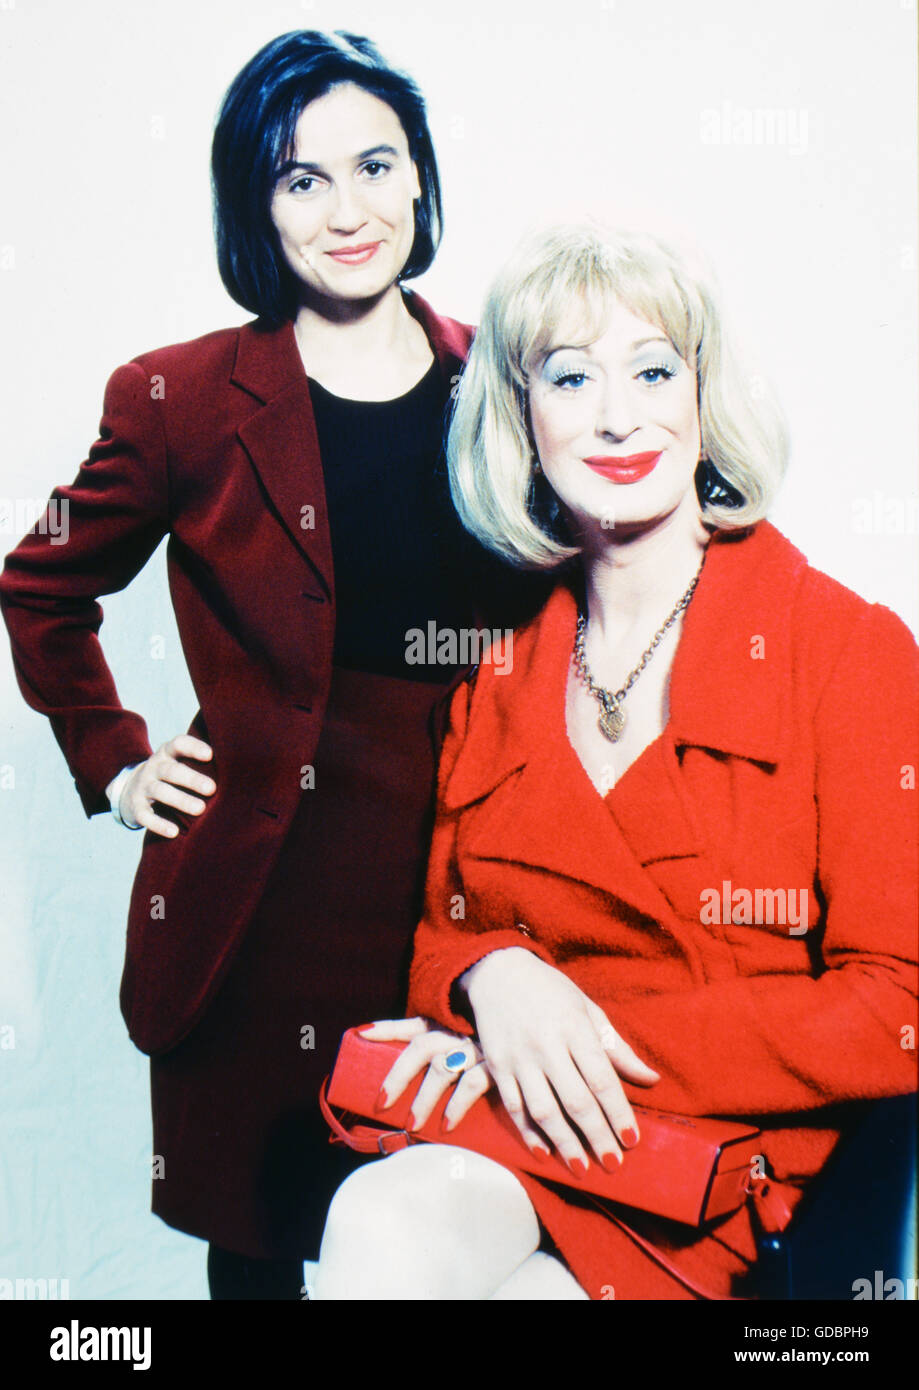 Maischberger, Sandra, * 26.8.1966, German journalist, TV presenter, half length, with Lilo Wanders, February 1996, Stock Photo